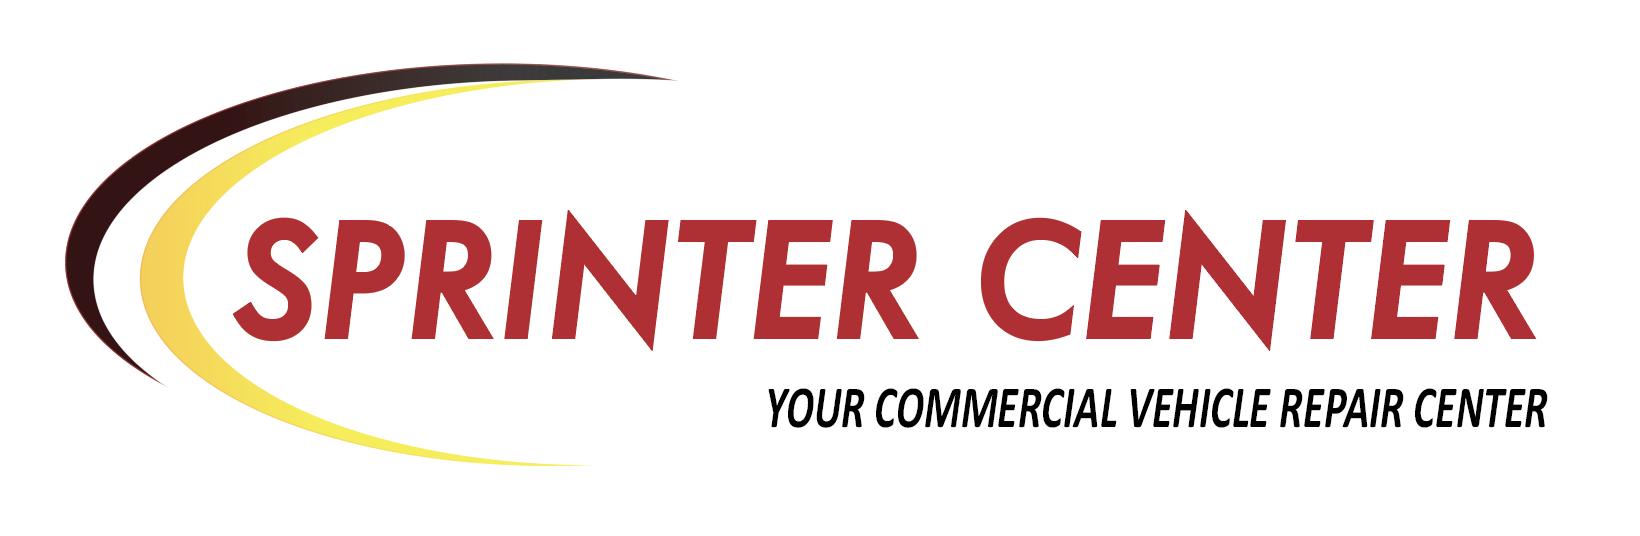 Sprinter Center